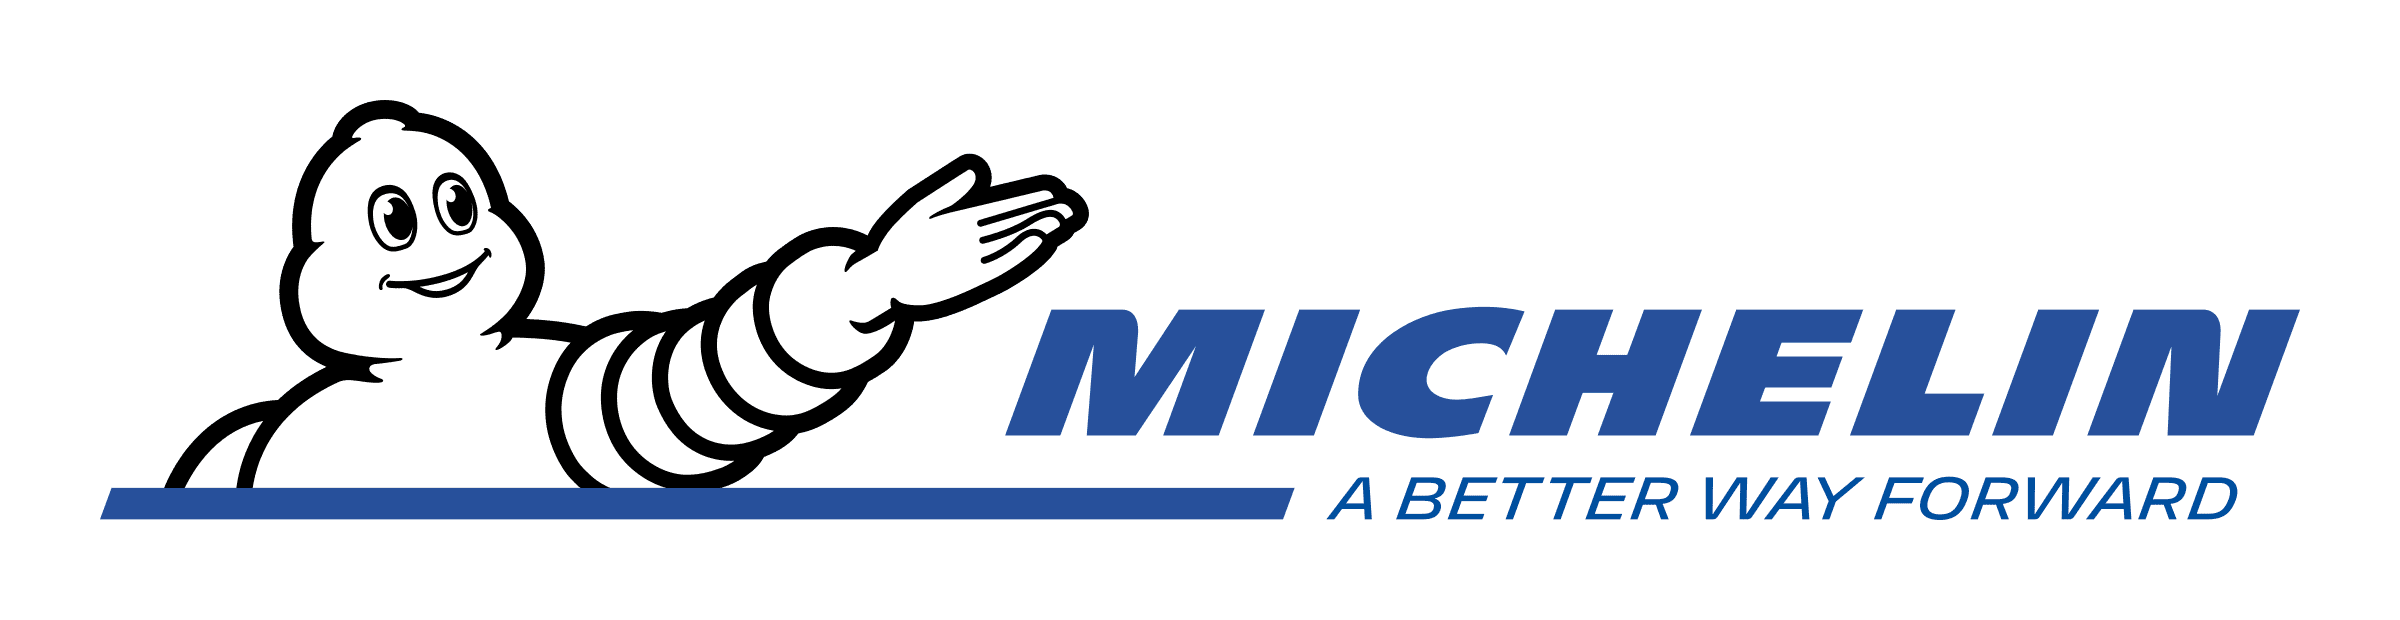 michelin-logo-png-transparent